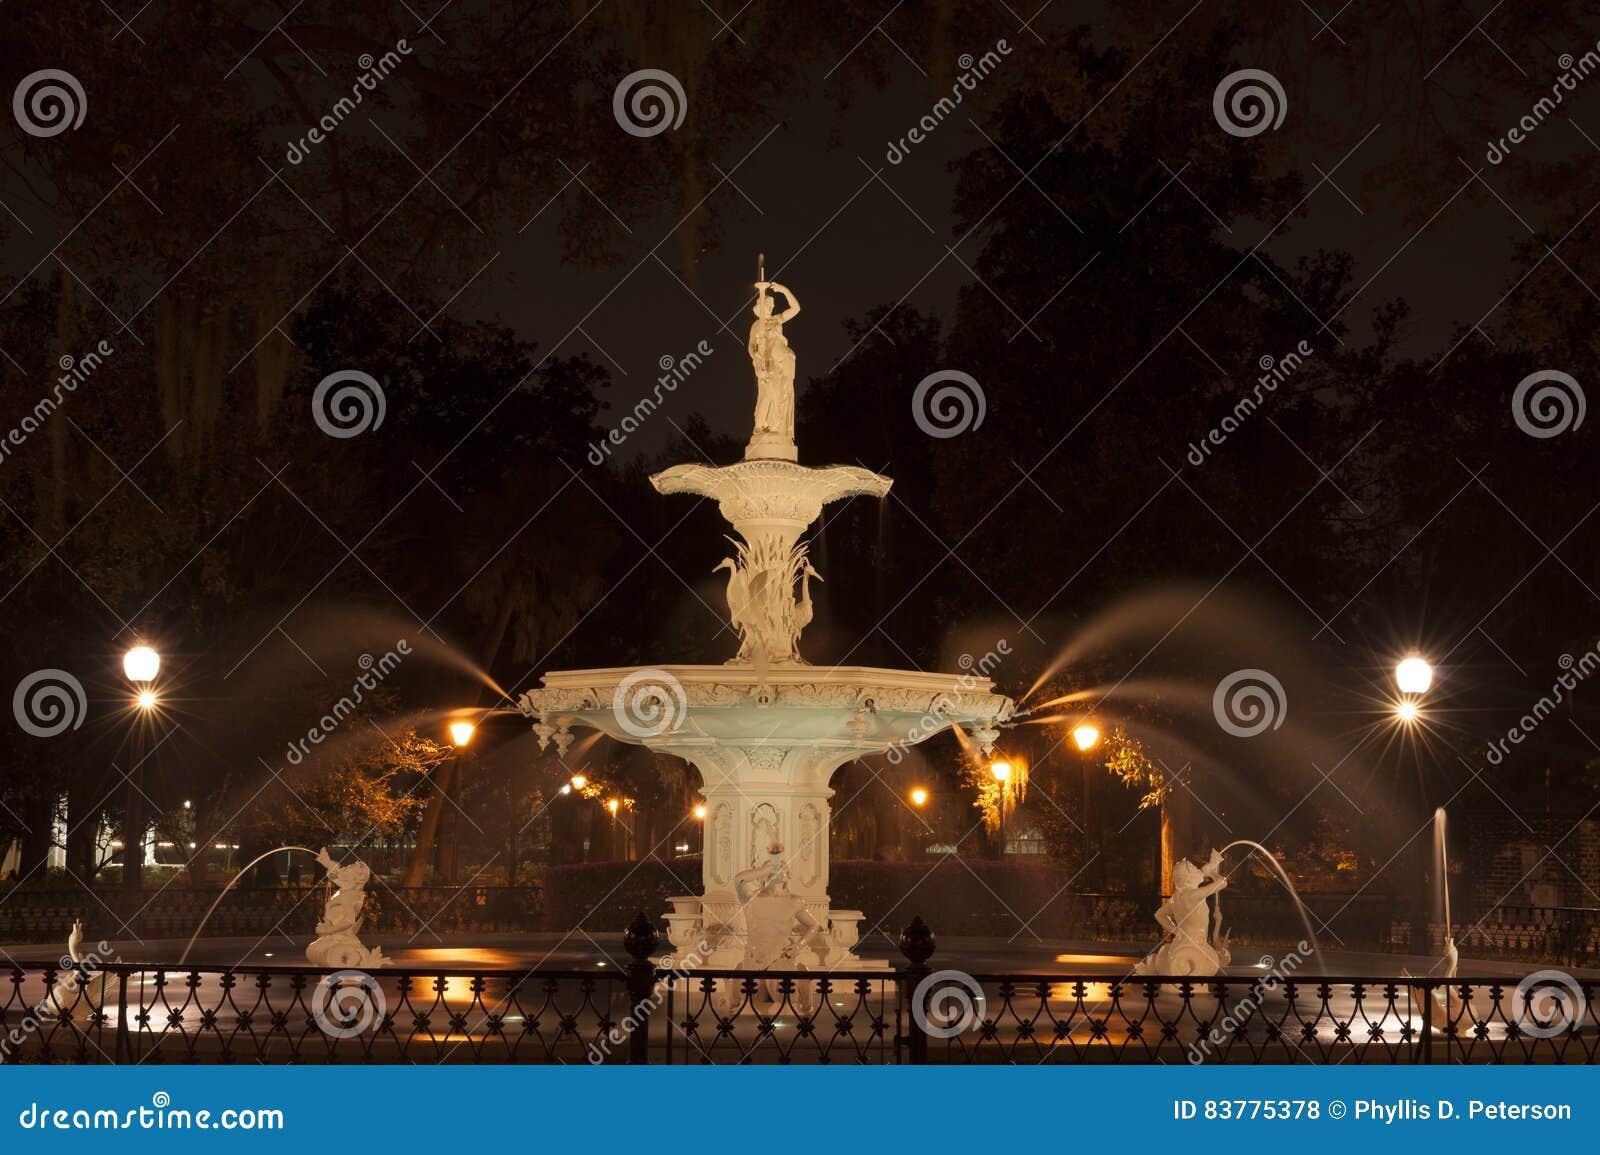 Forsyth Park Fountain of Savannah, GA at night